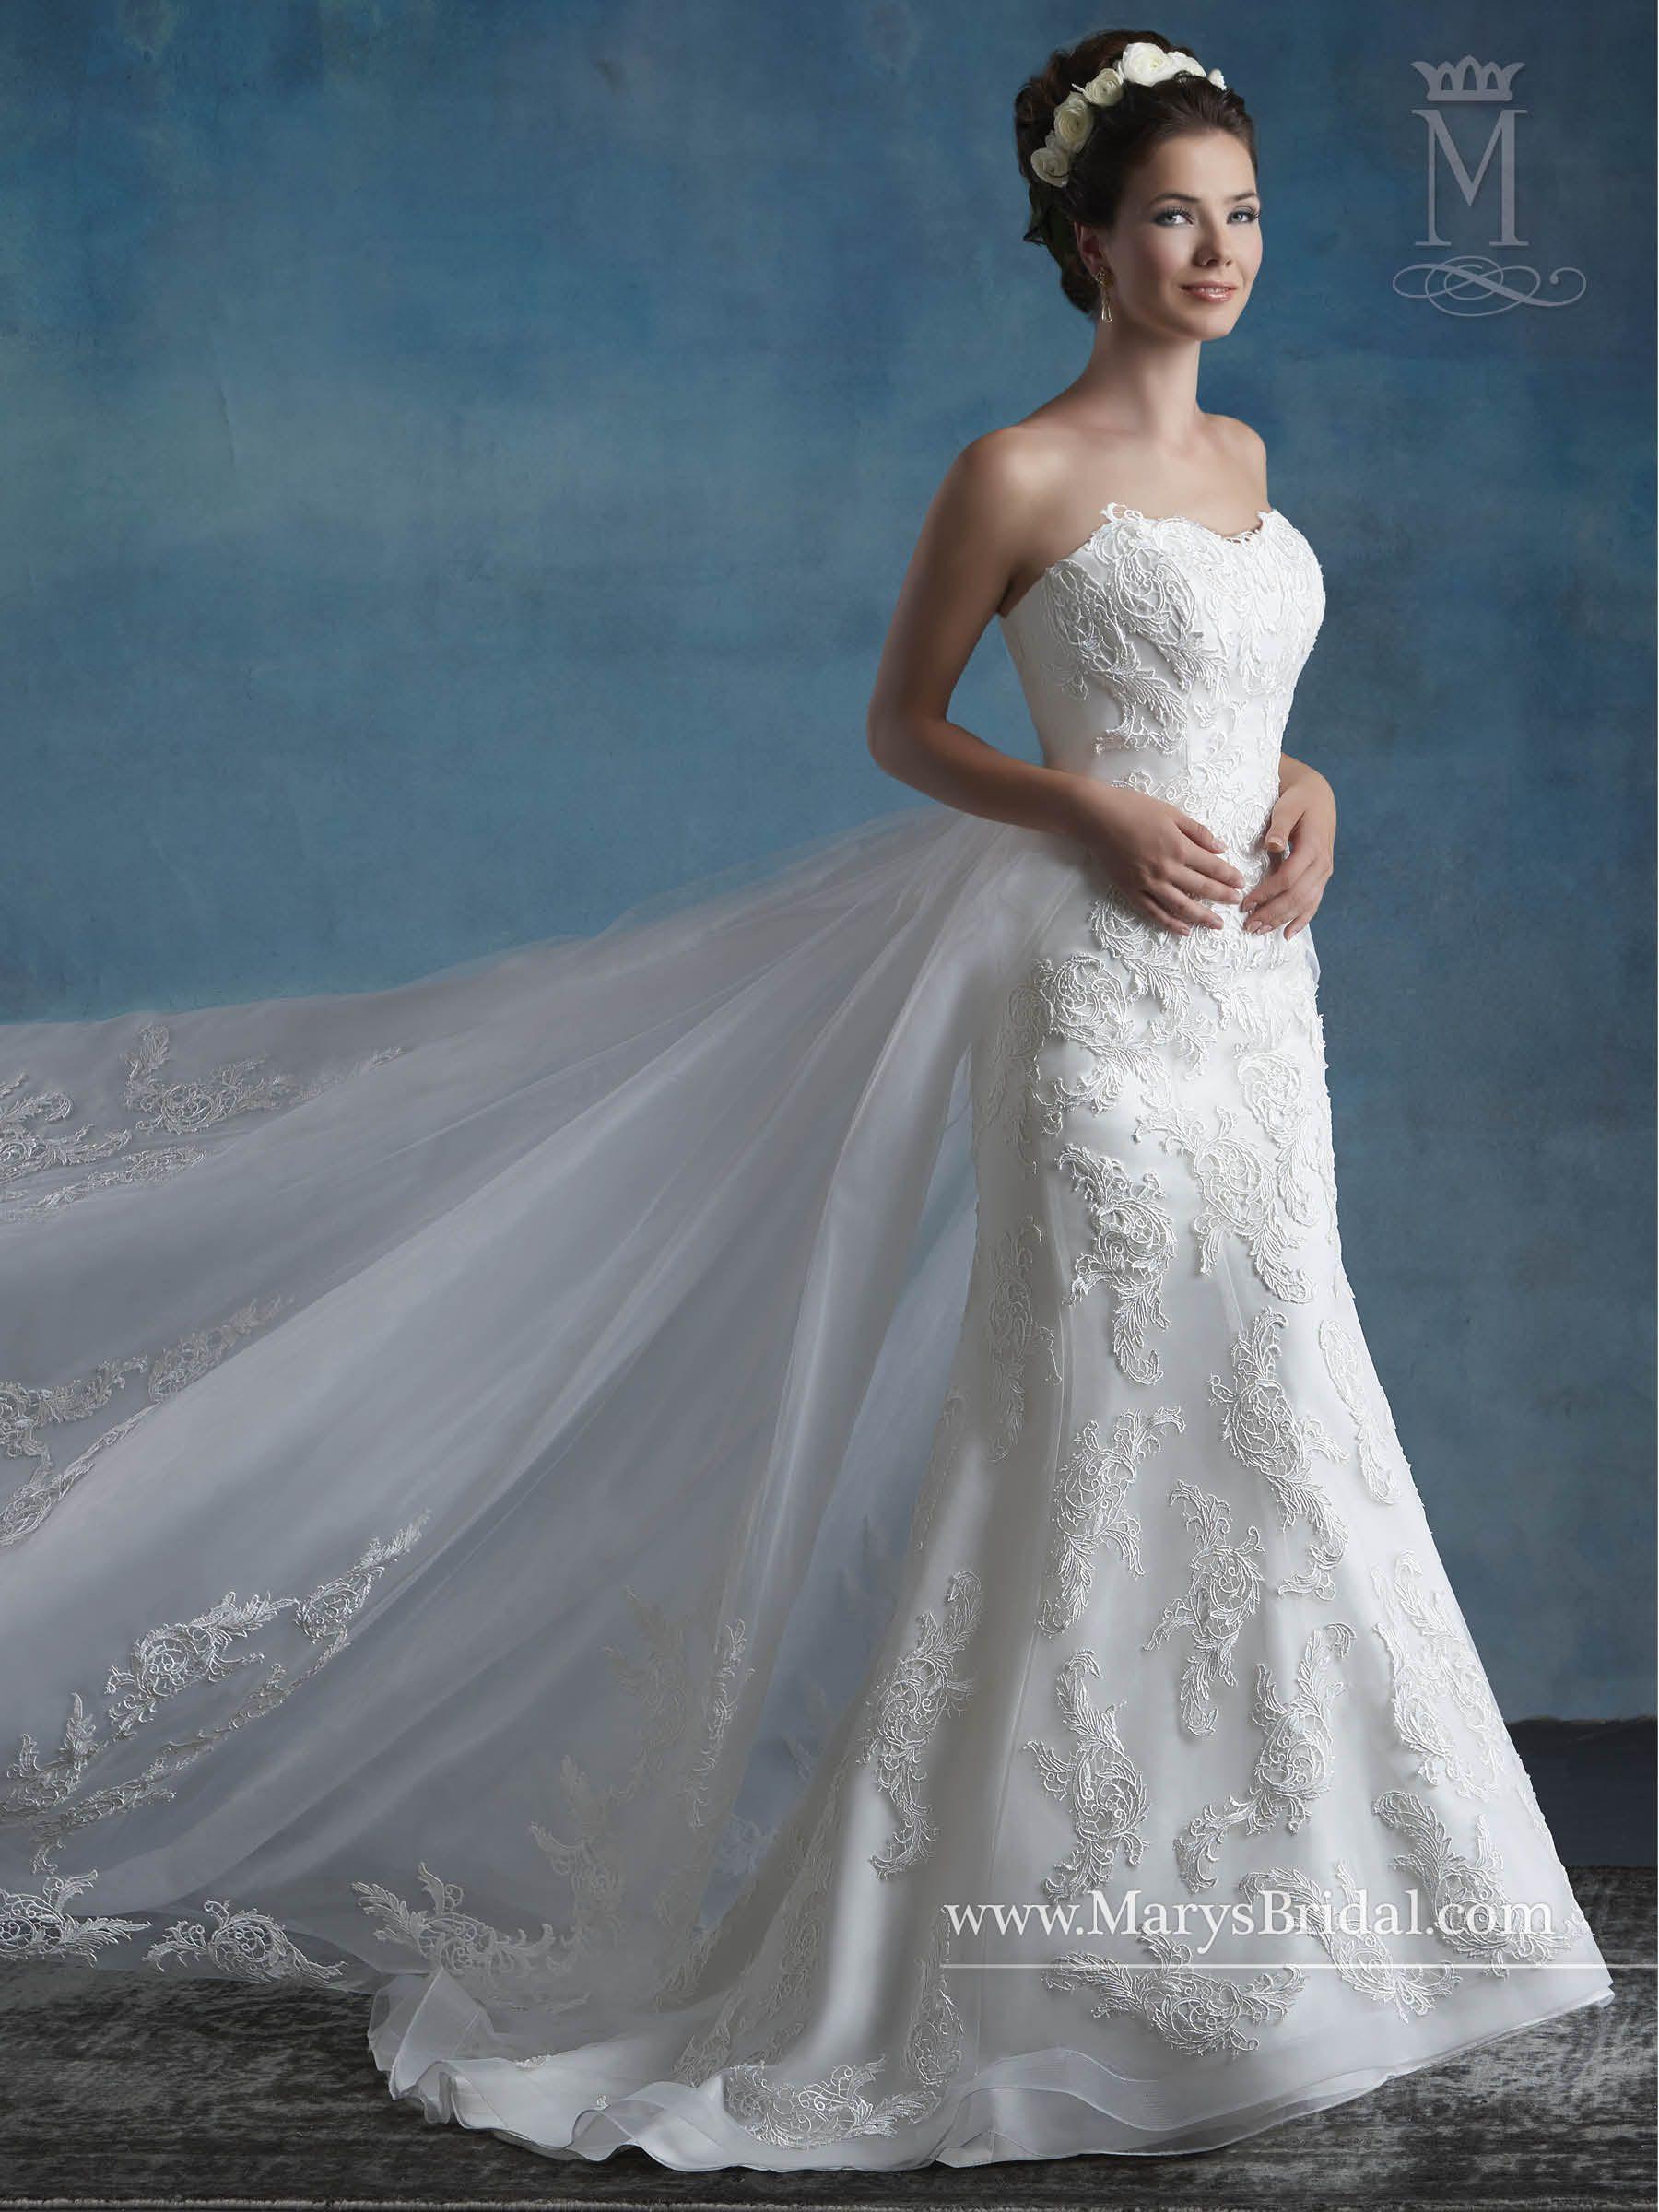 Superb Fit N Flare Wedding Dress   Wedding Photography